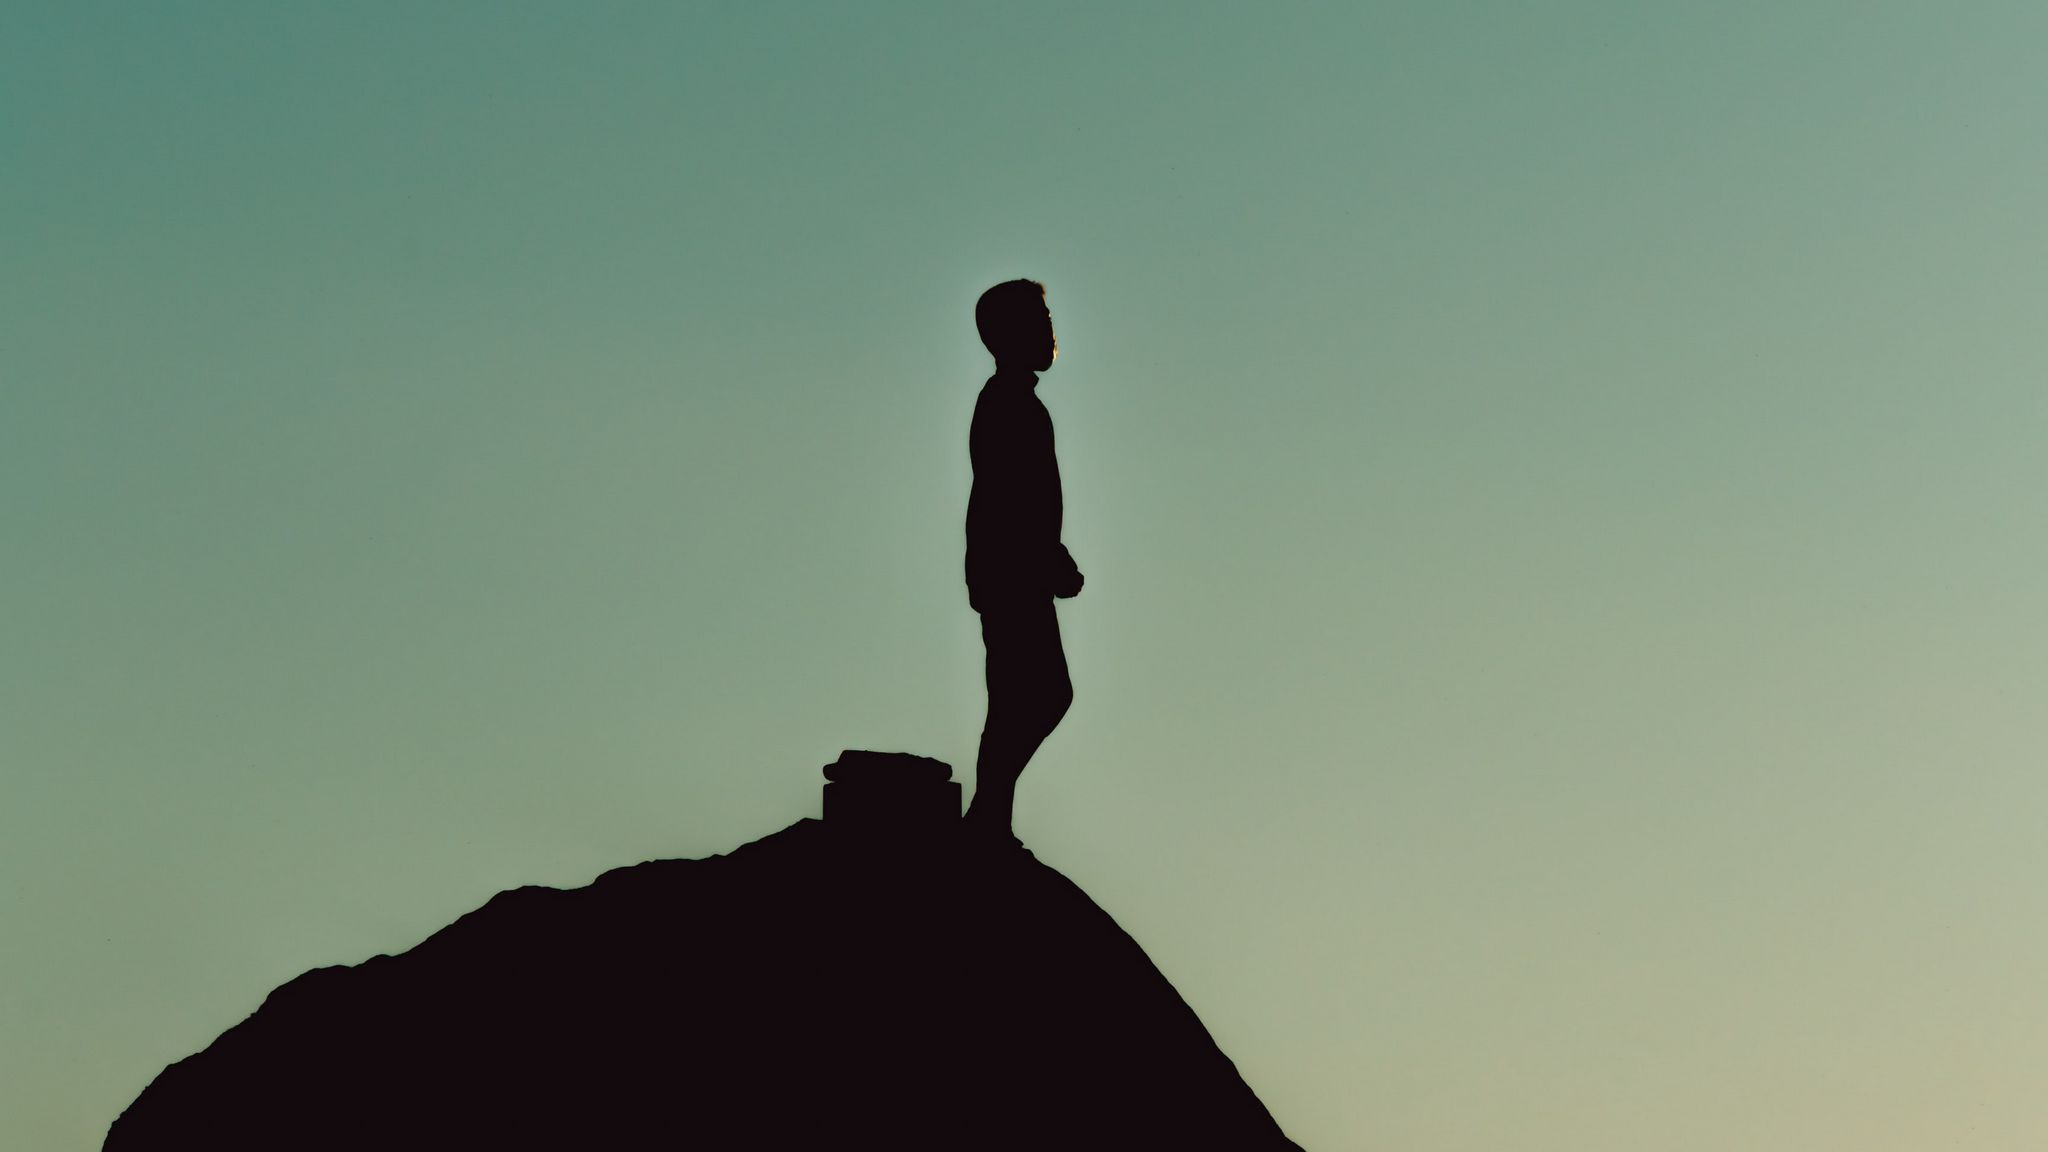 2048x1152 Wallpaper silhouette, alone, mountain, twilight, dark